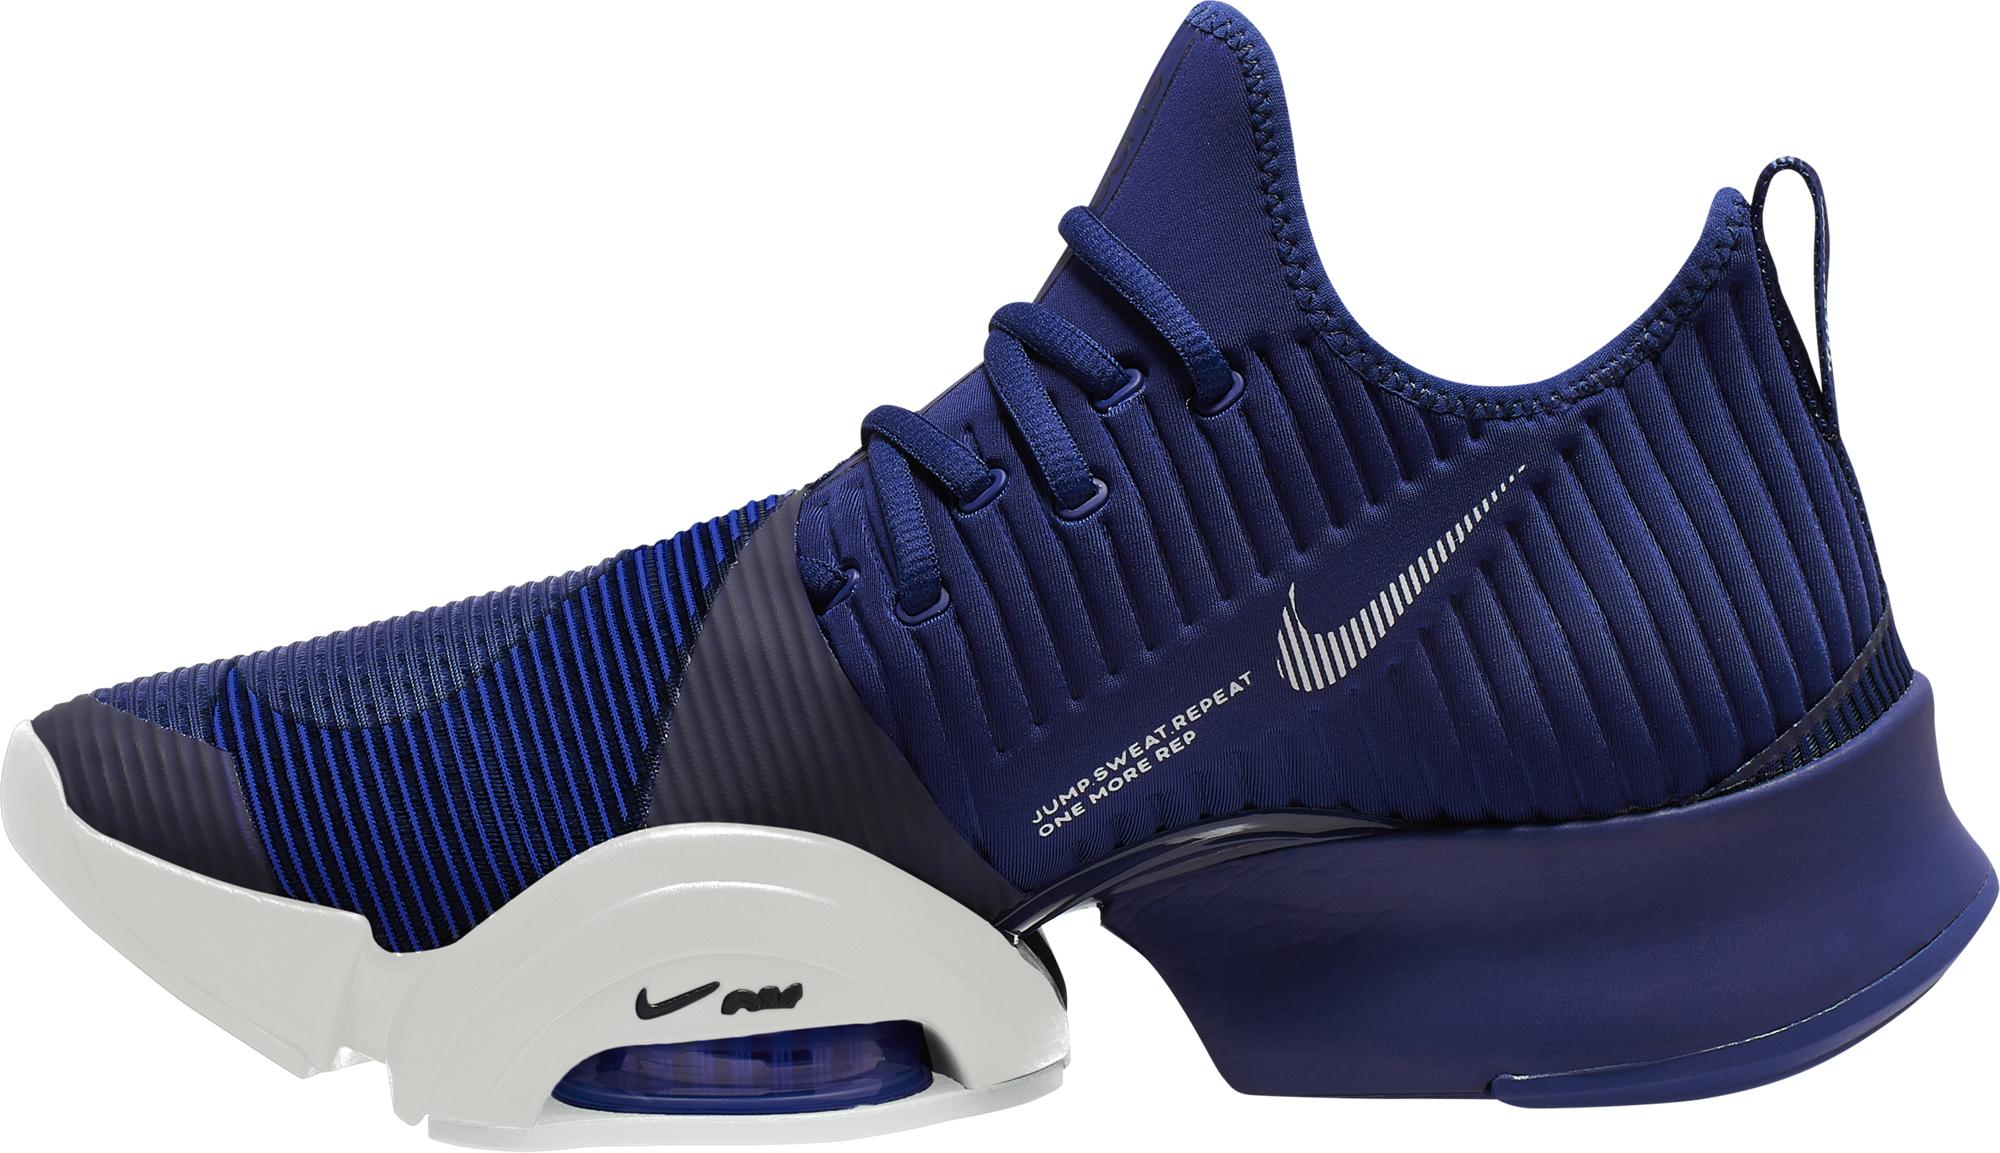 Nike Кроссовки мужские Air Zoom Superrep, размер 39,5